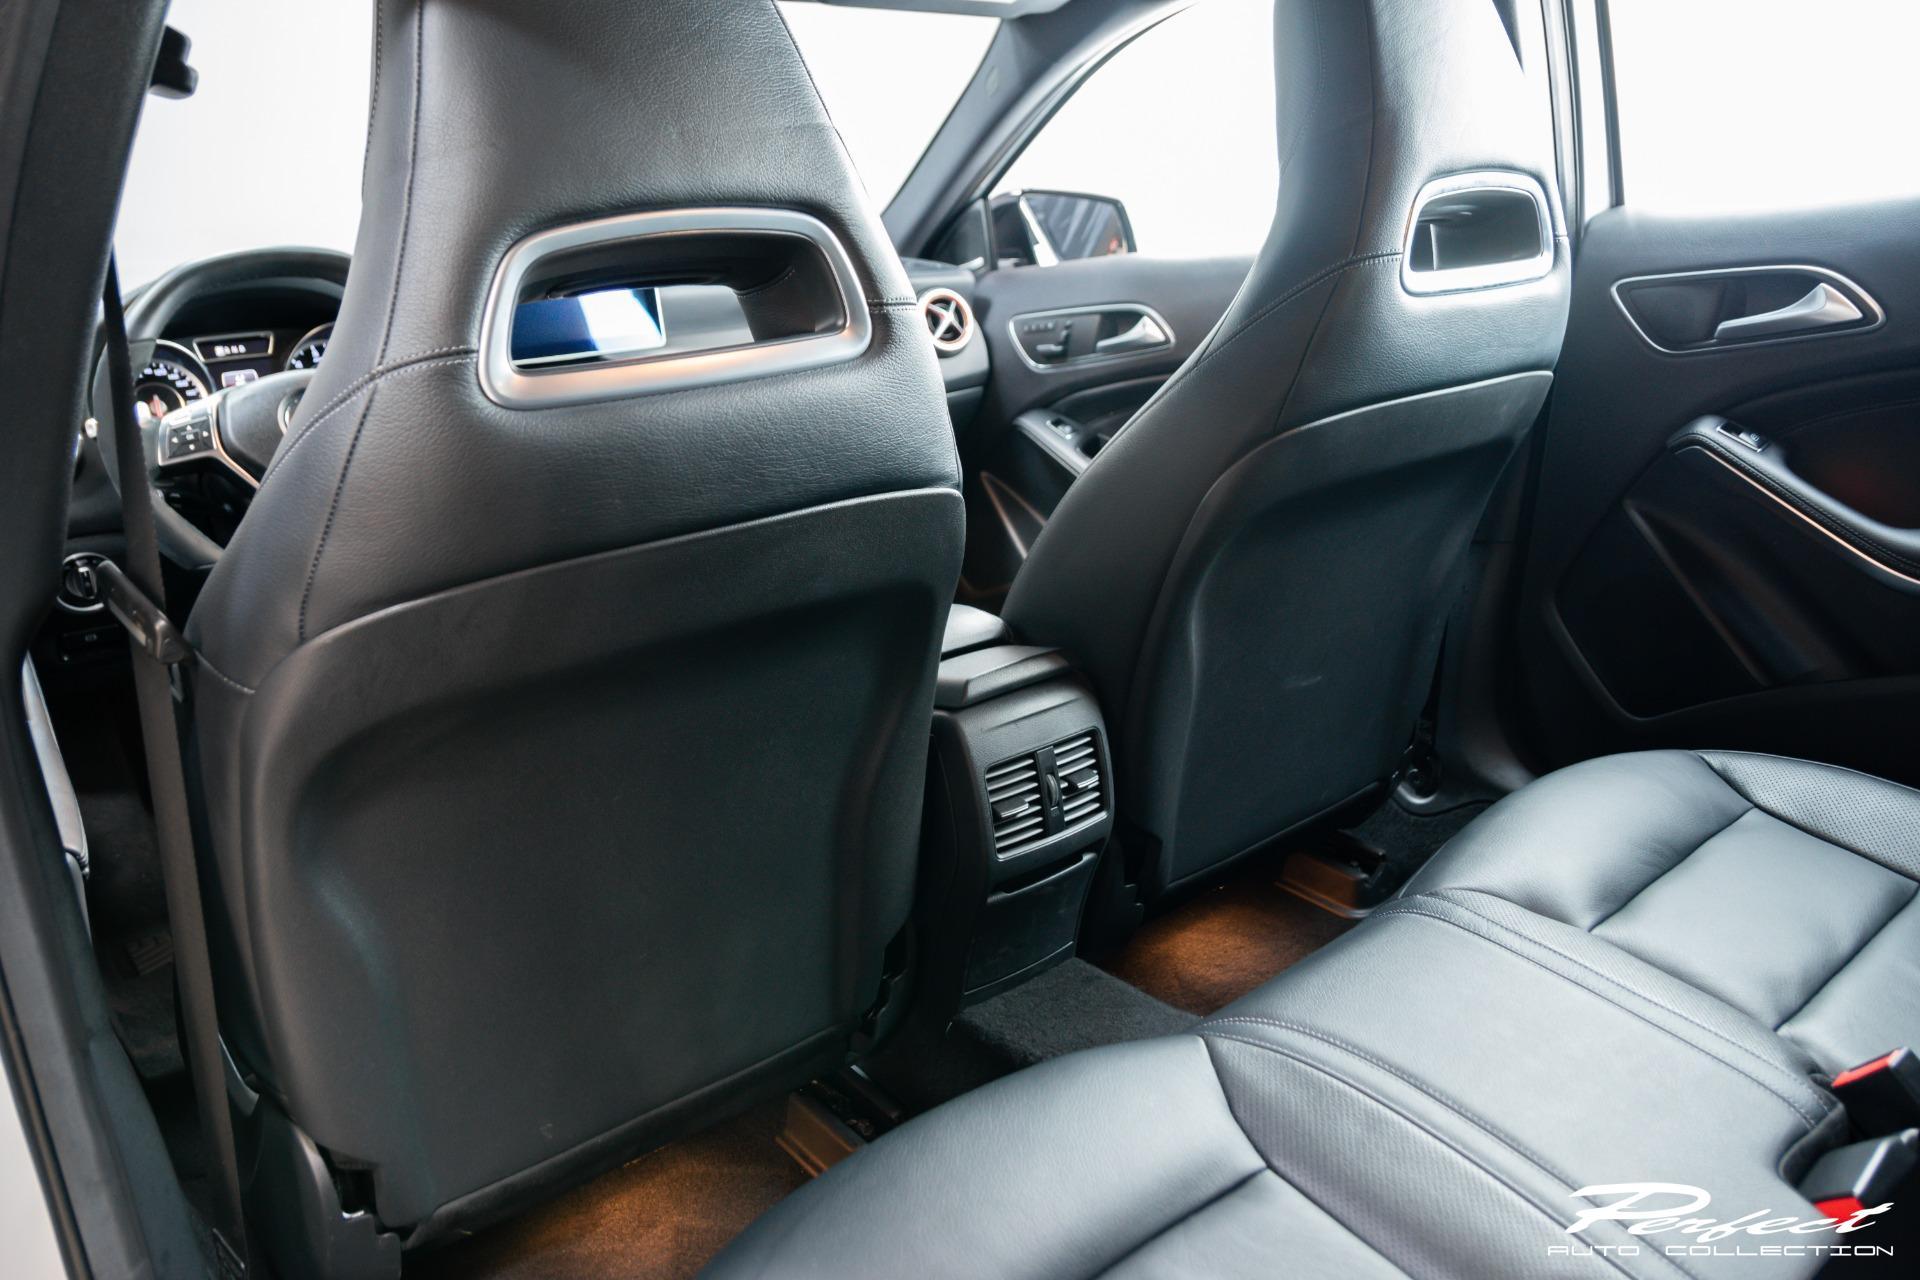 Used 2015 Mercedes Benz GLA GLA 45 AMG